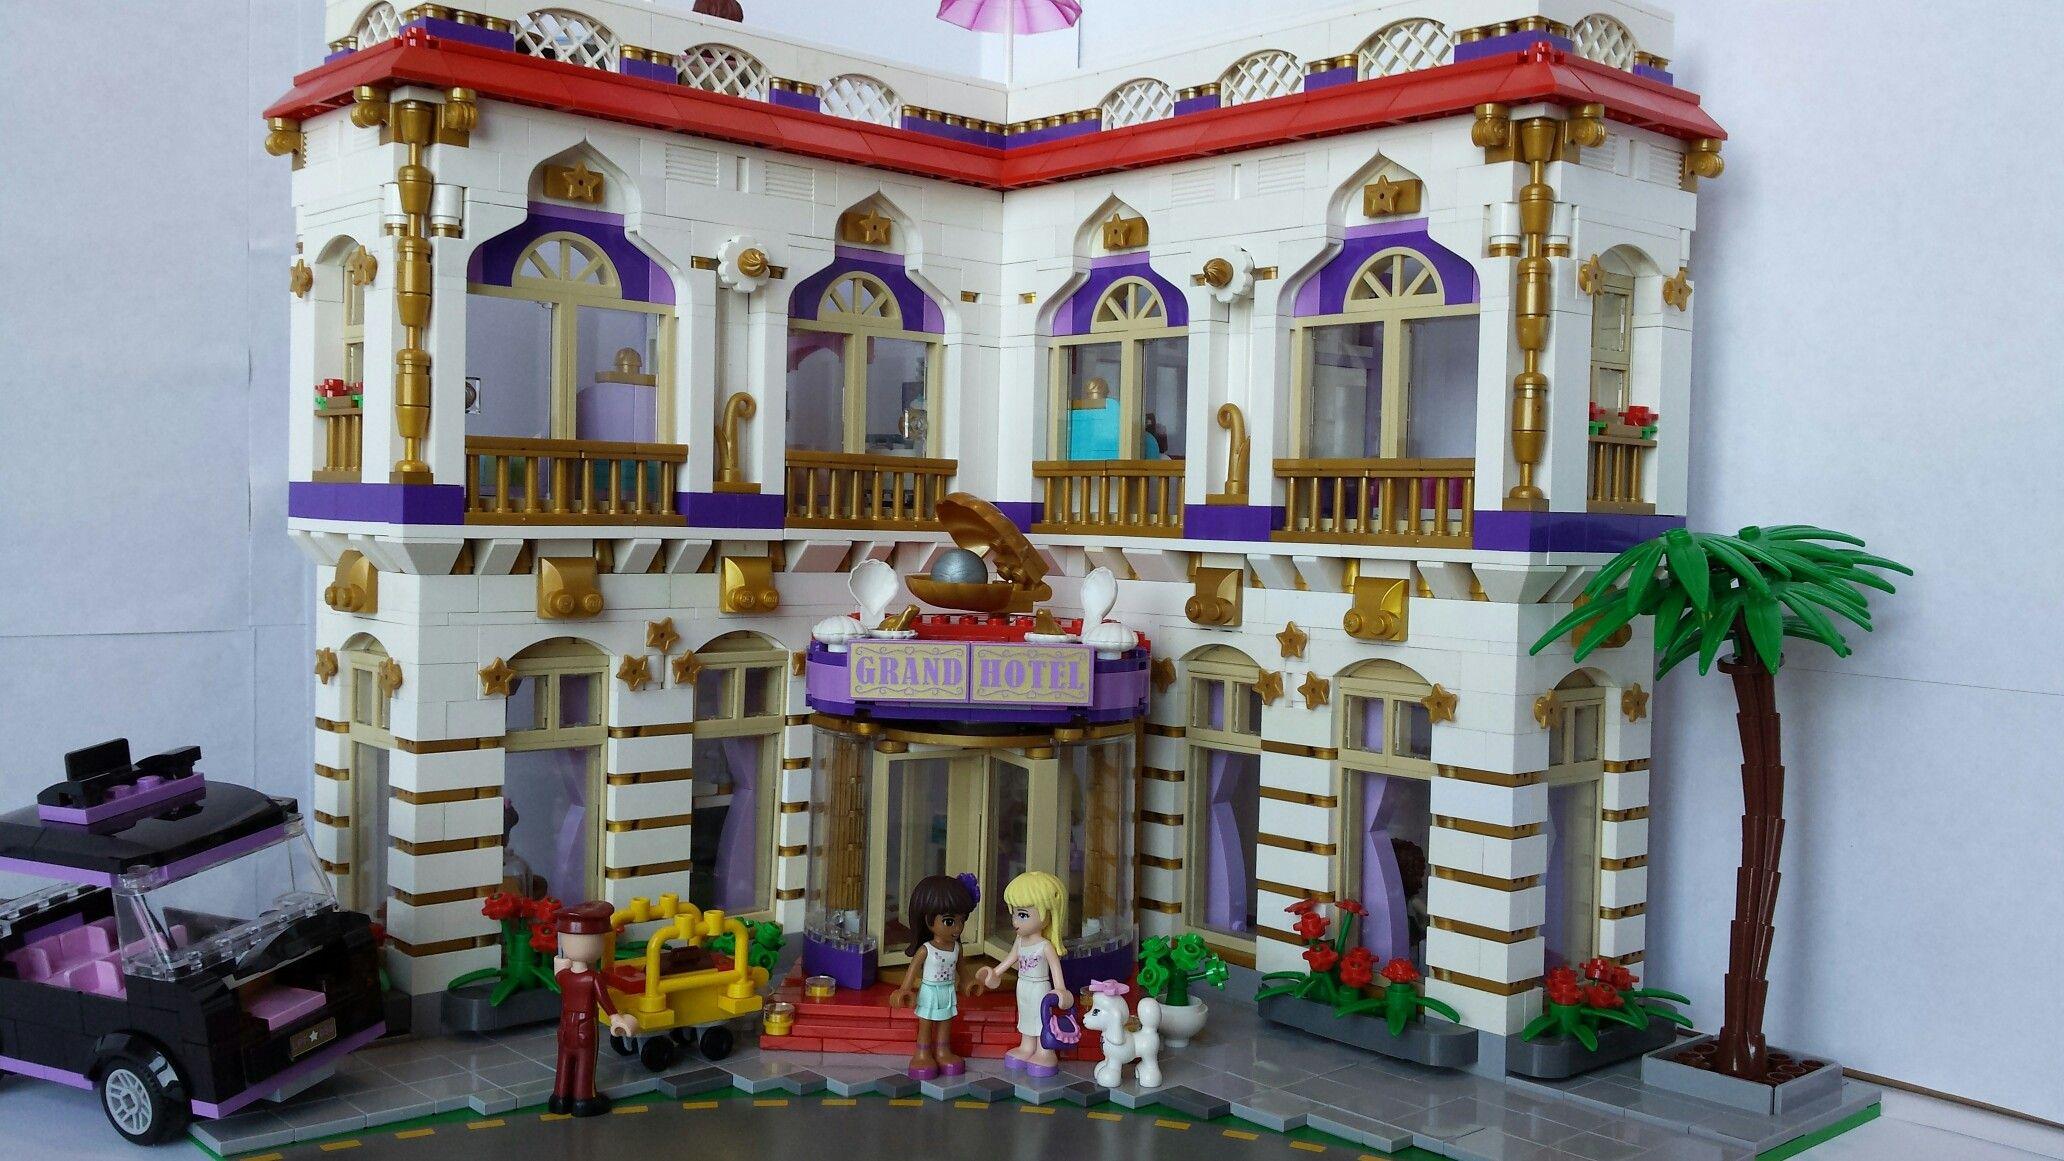 Grand Hotel Lego Friends 41101 Online